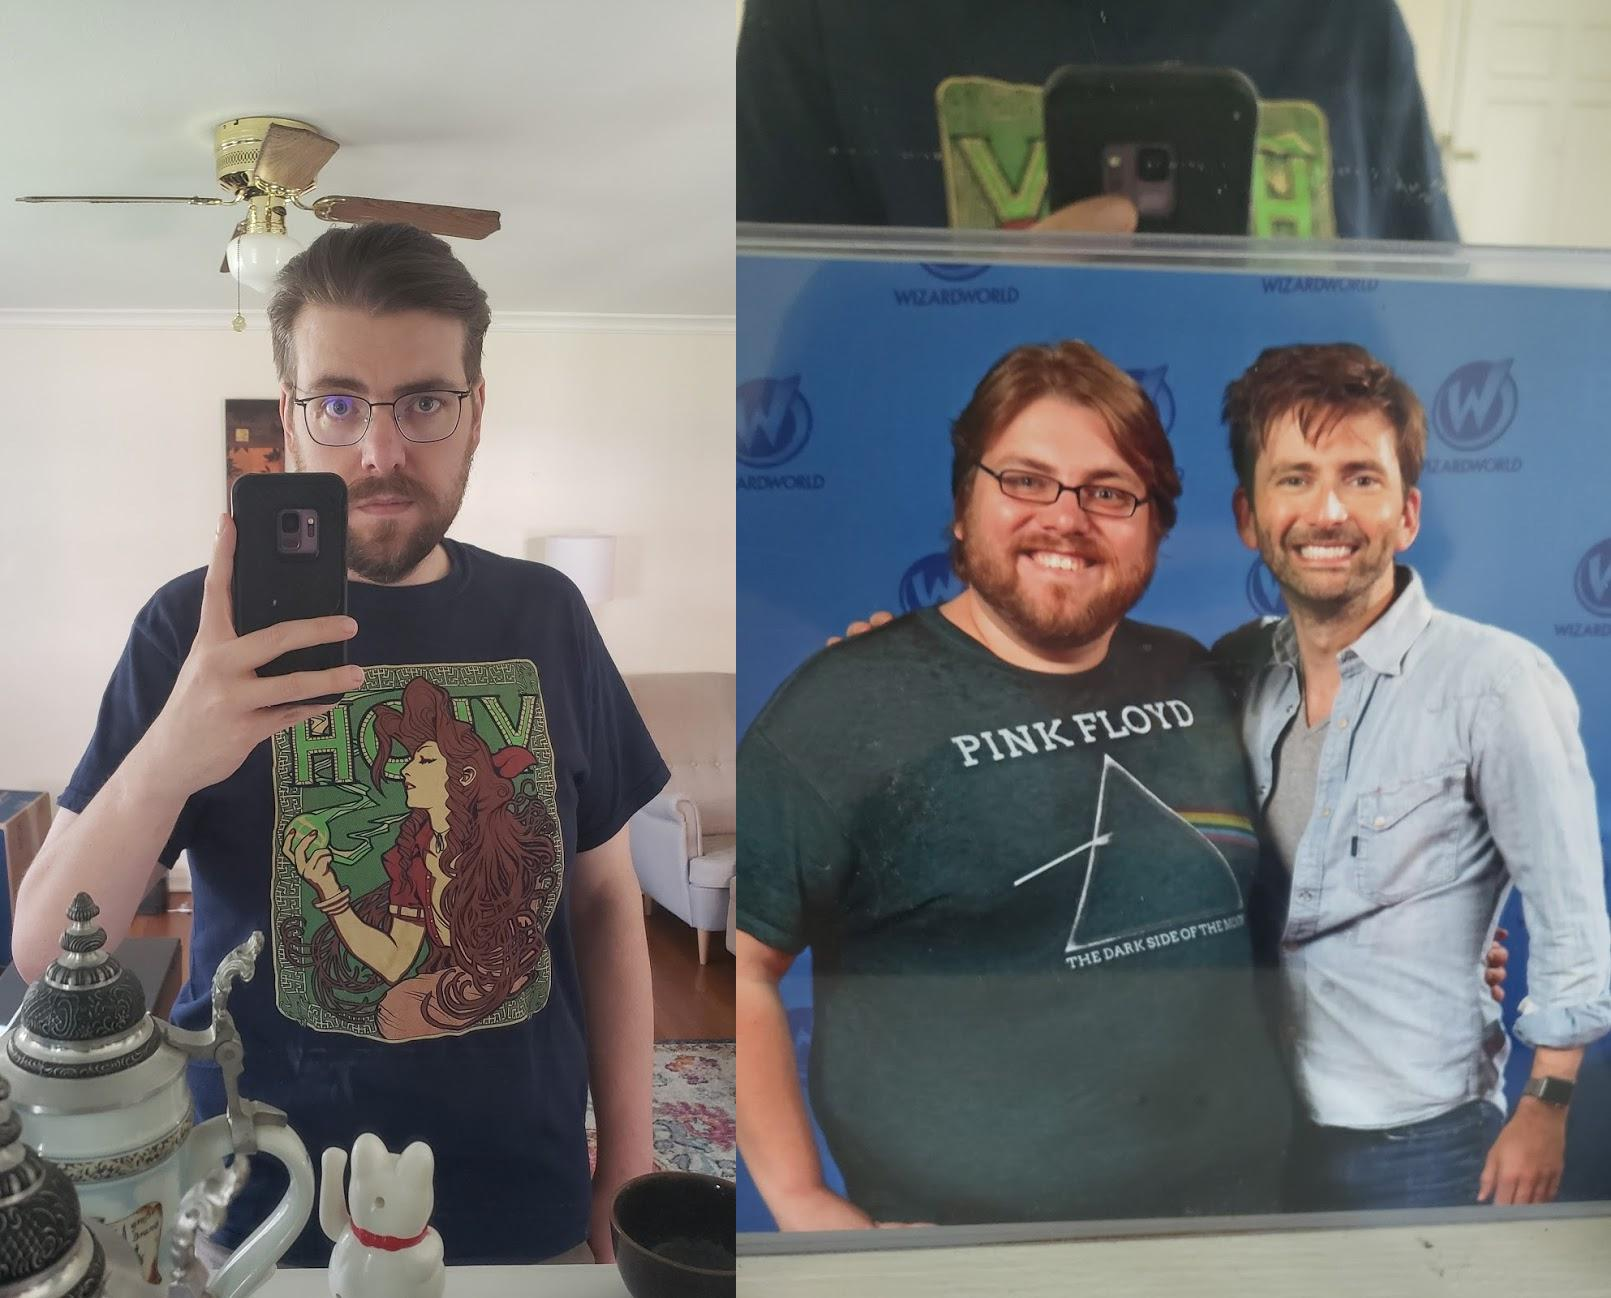 6'1 Male Progress Pics of 148 lbs Weight Loss 375 lbs to 227 lbs